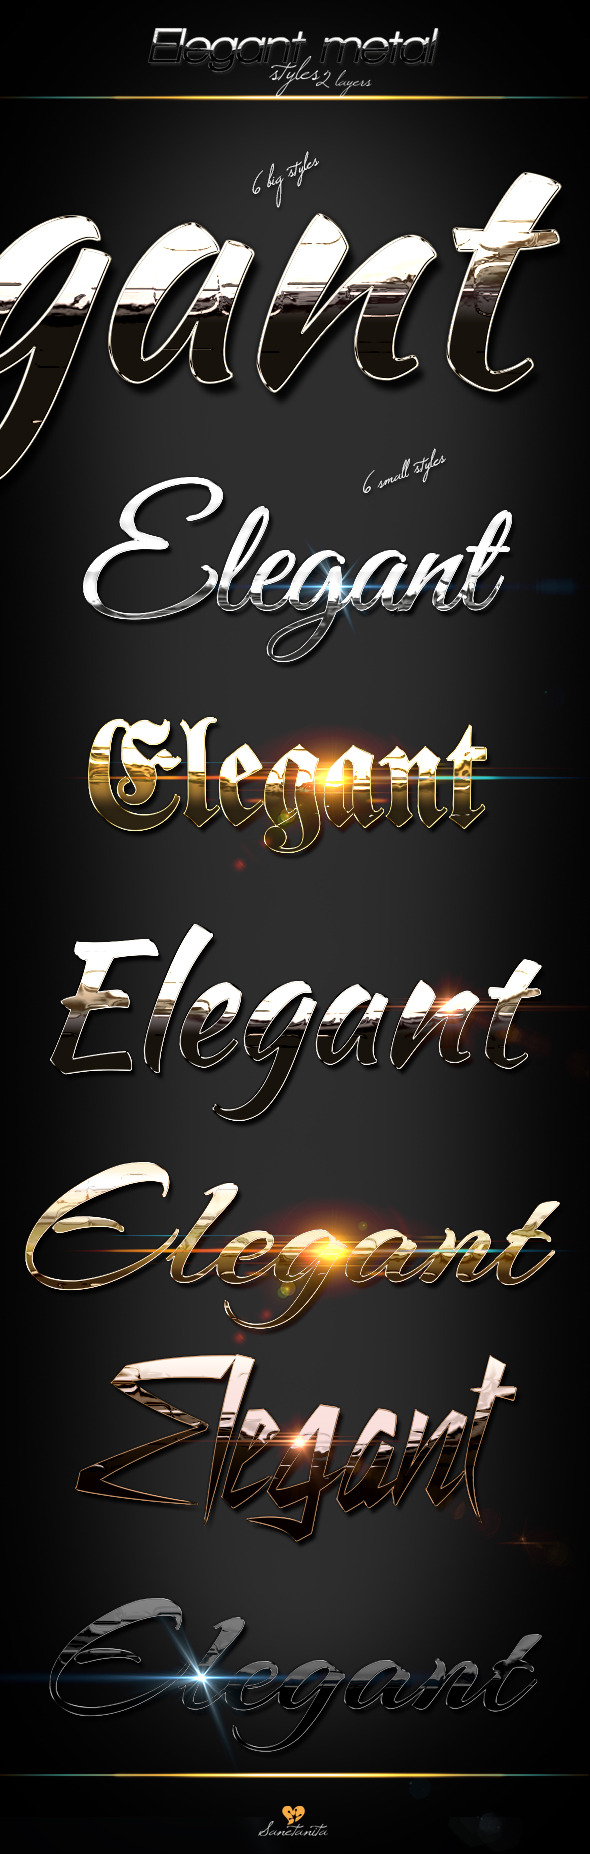 Elegant Metal Styles - Text Effects Styles